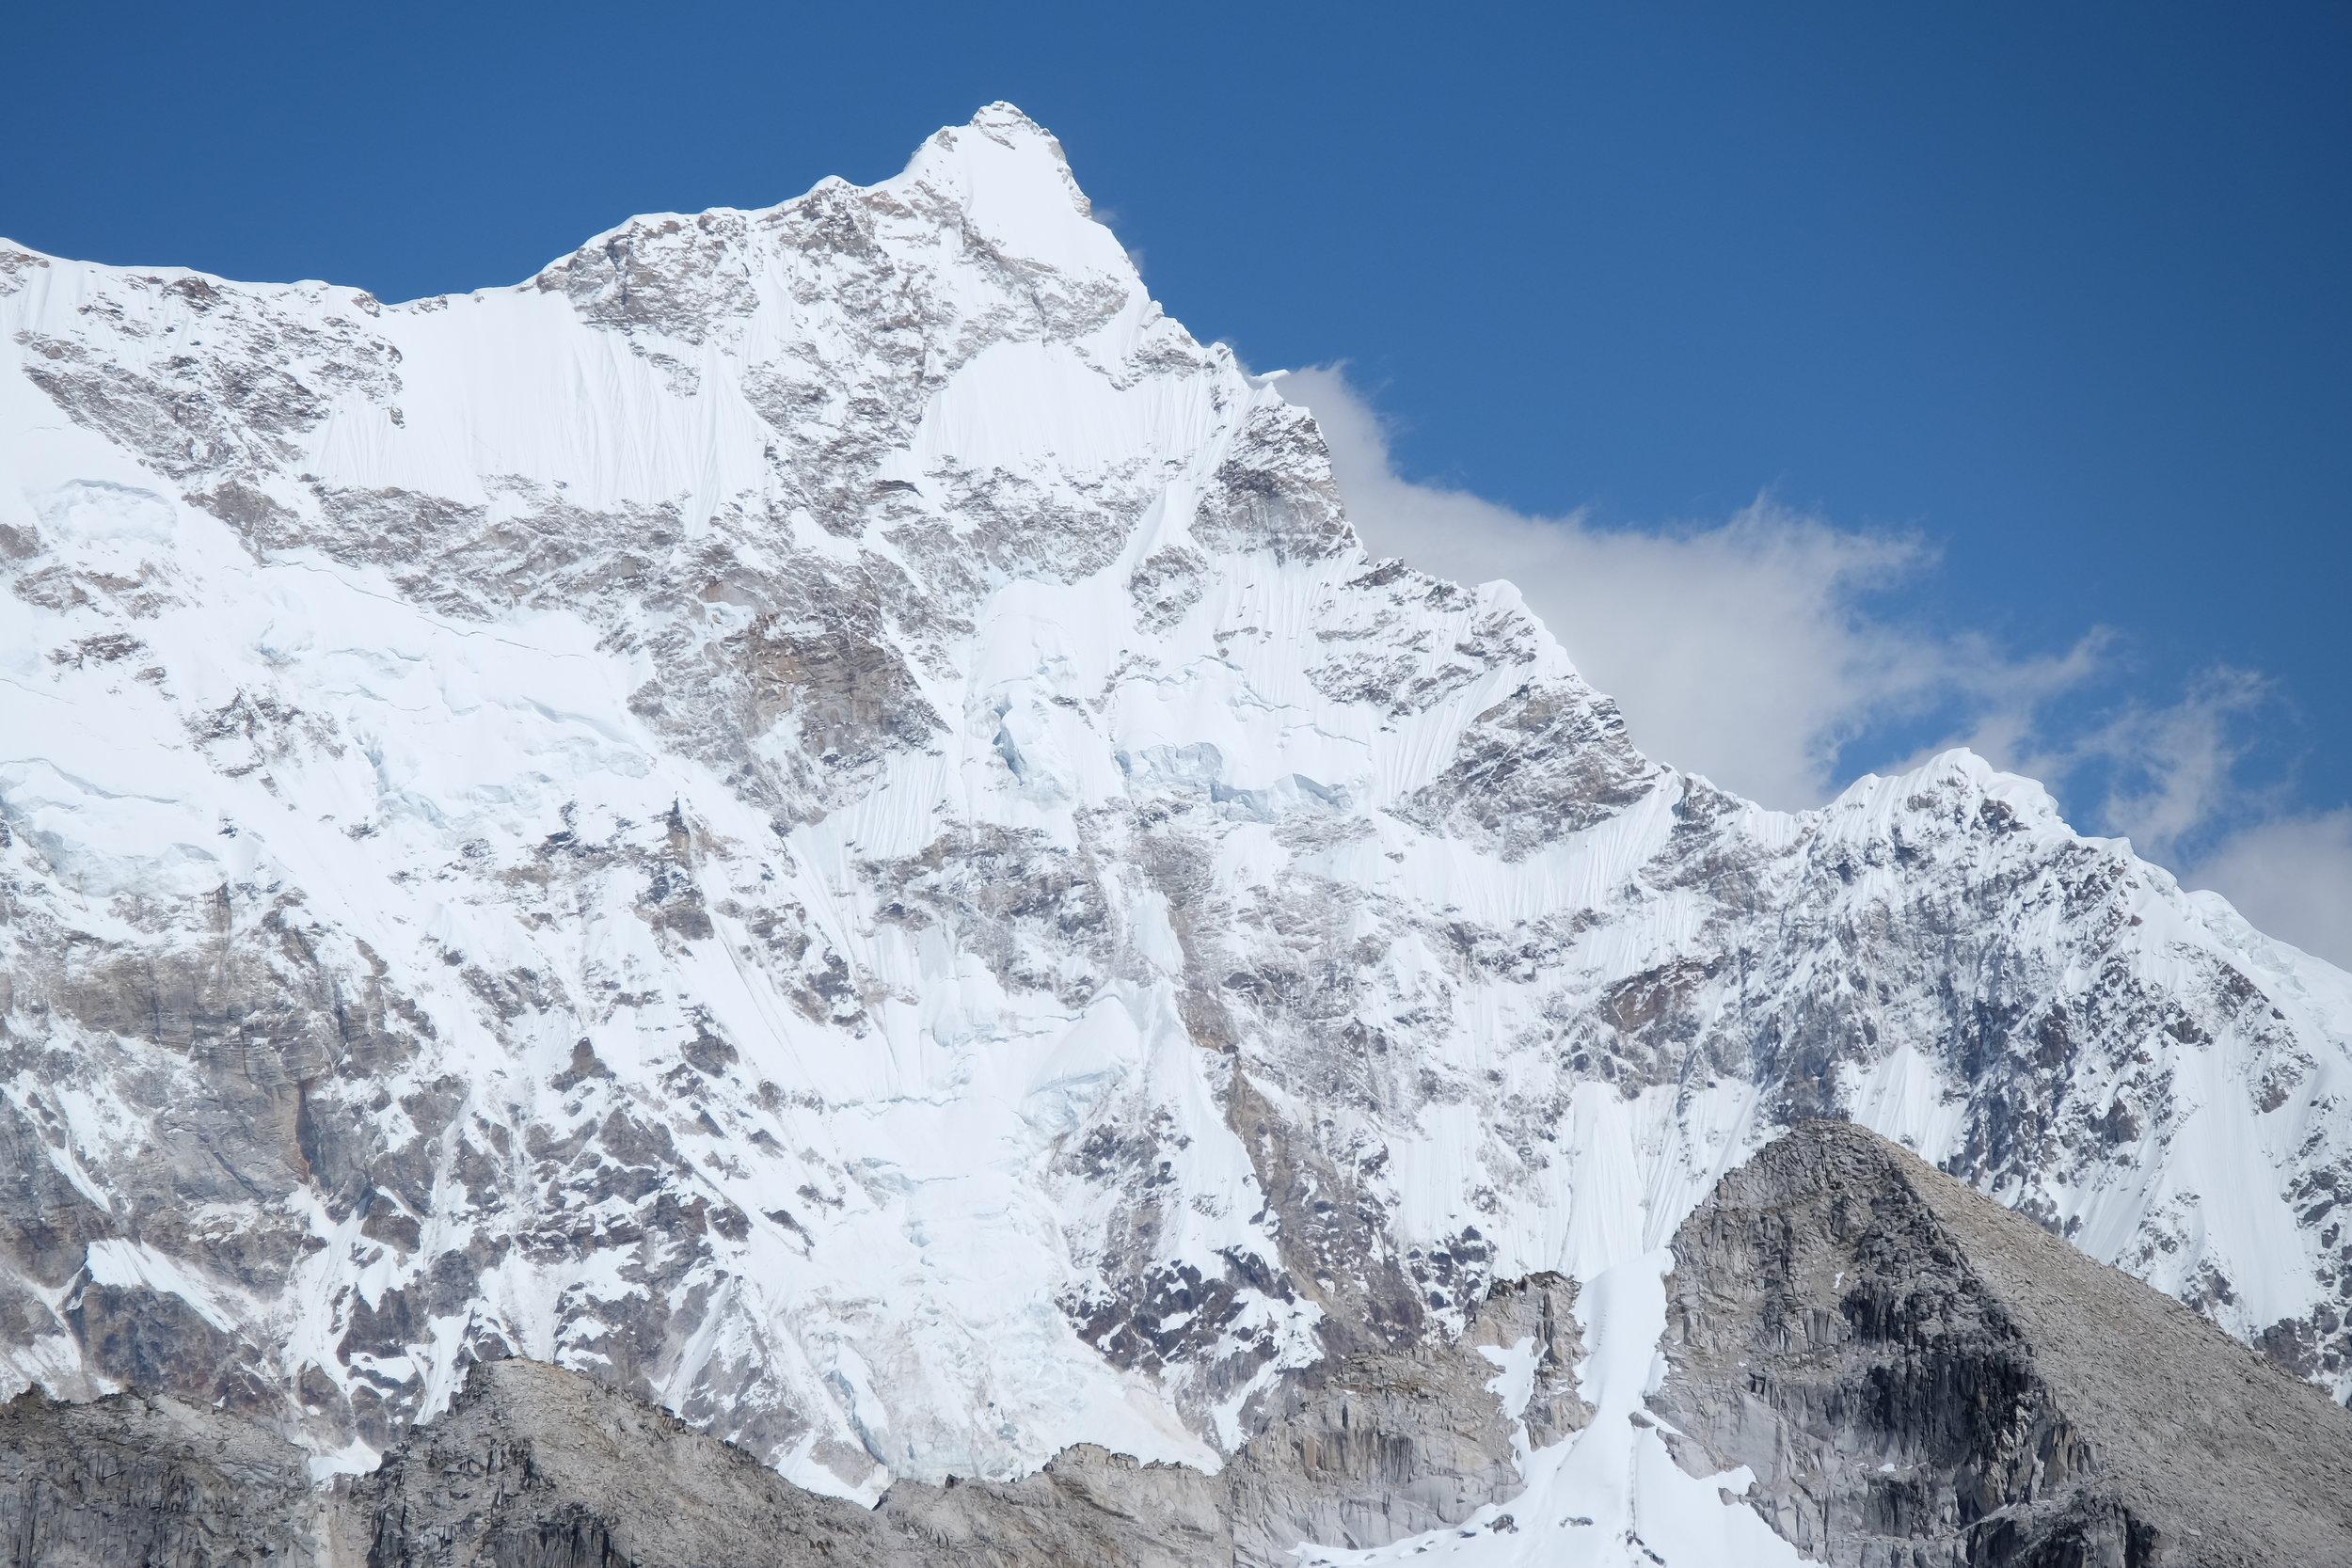 Gangkhar Puensum: the highest unclimbed mountain in the world. Photo: Gradythebadger/Wikipedia